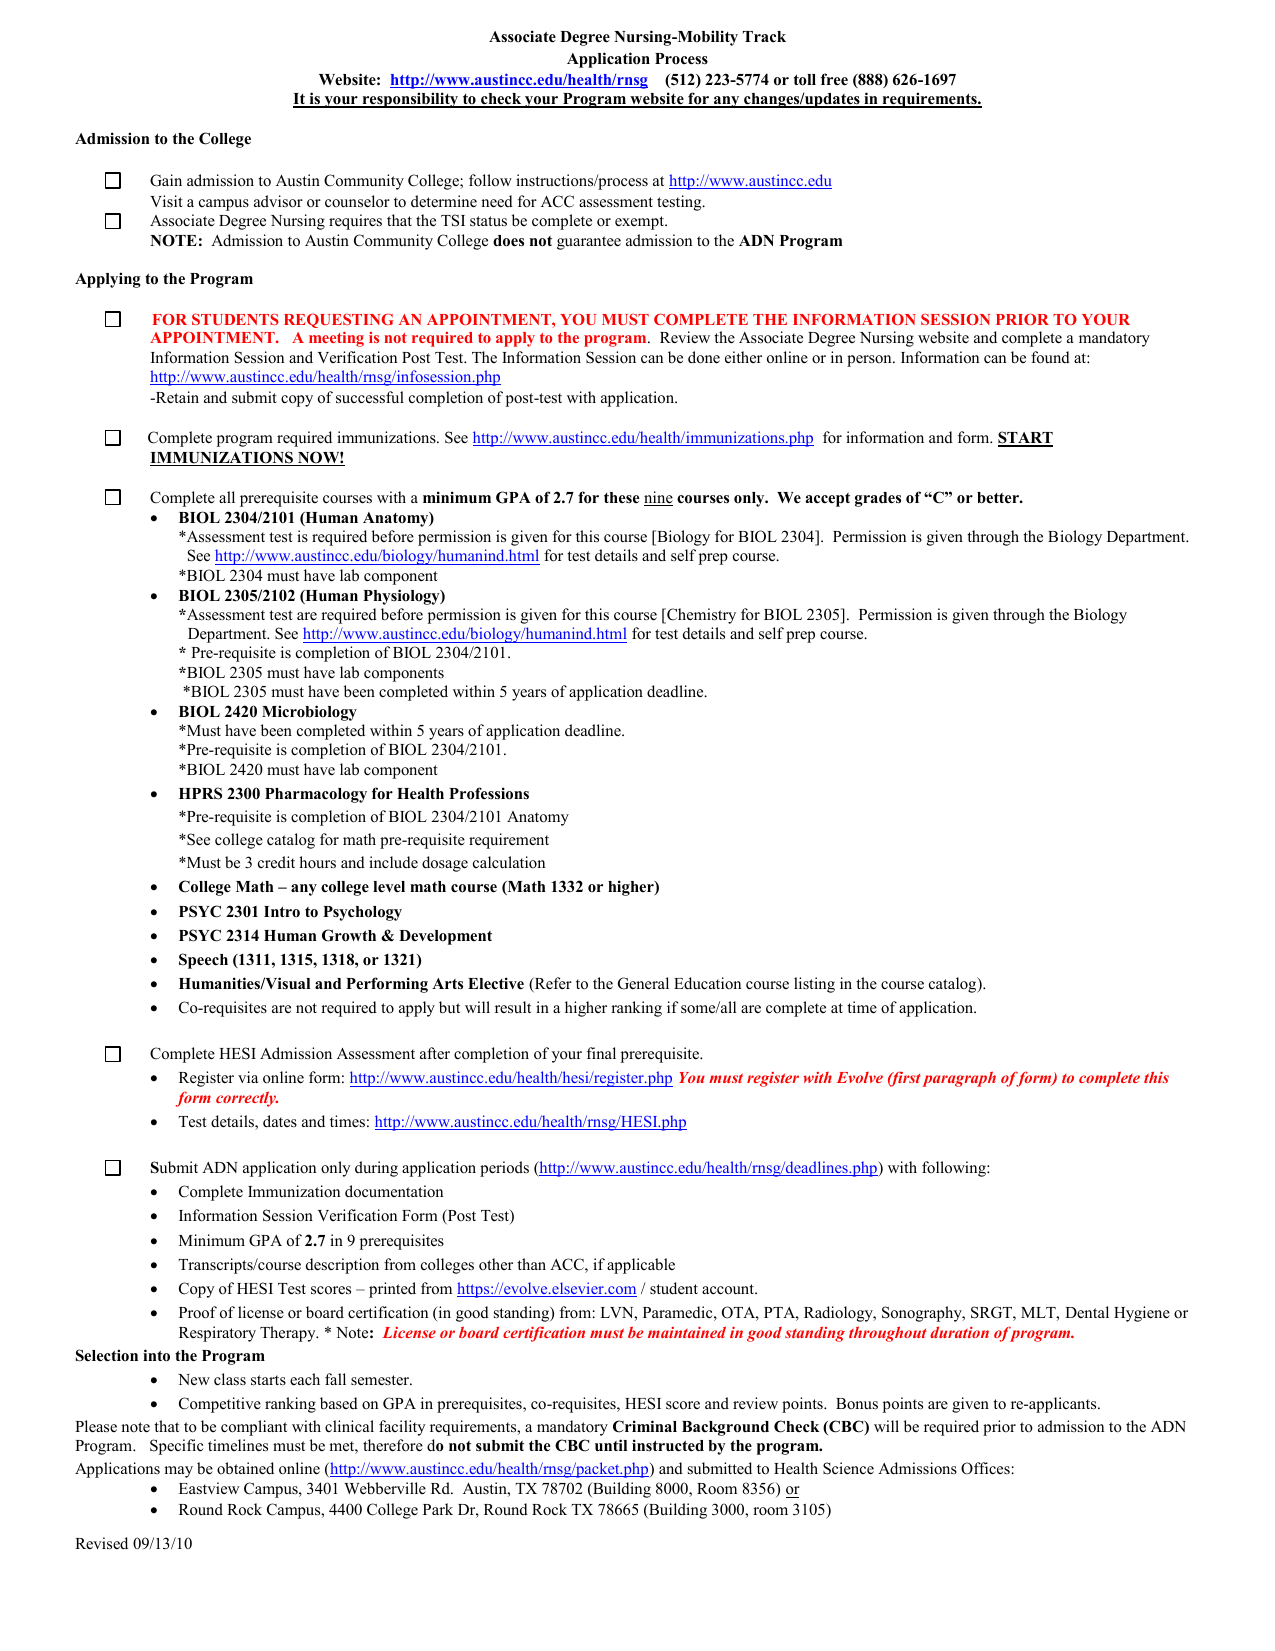 Associate Degree Nursing Mobility Track Application Process